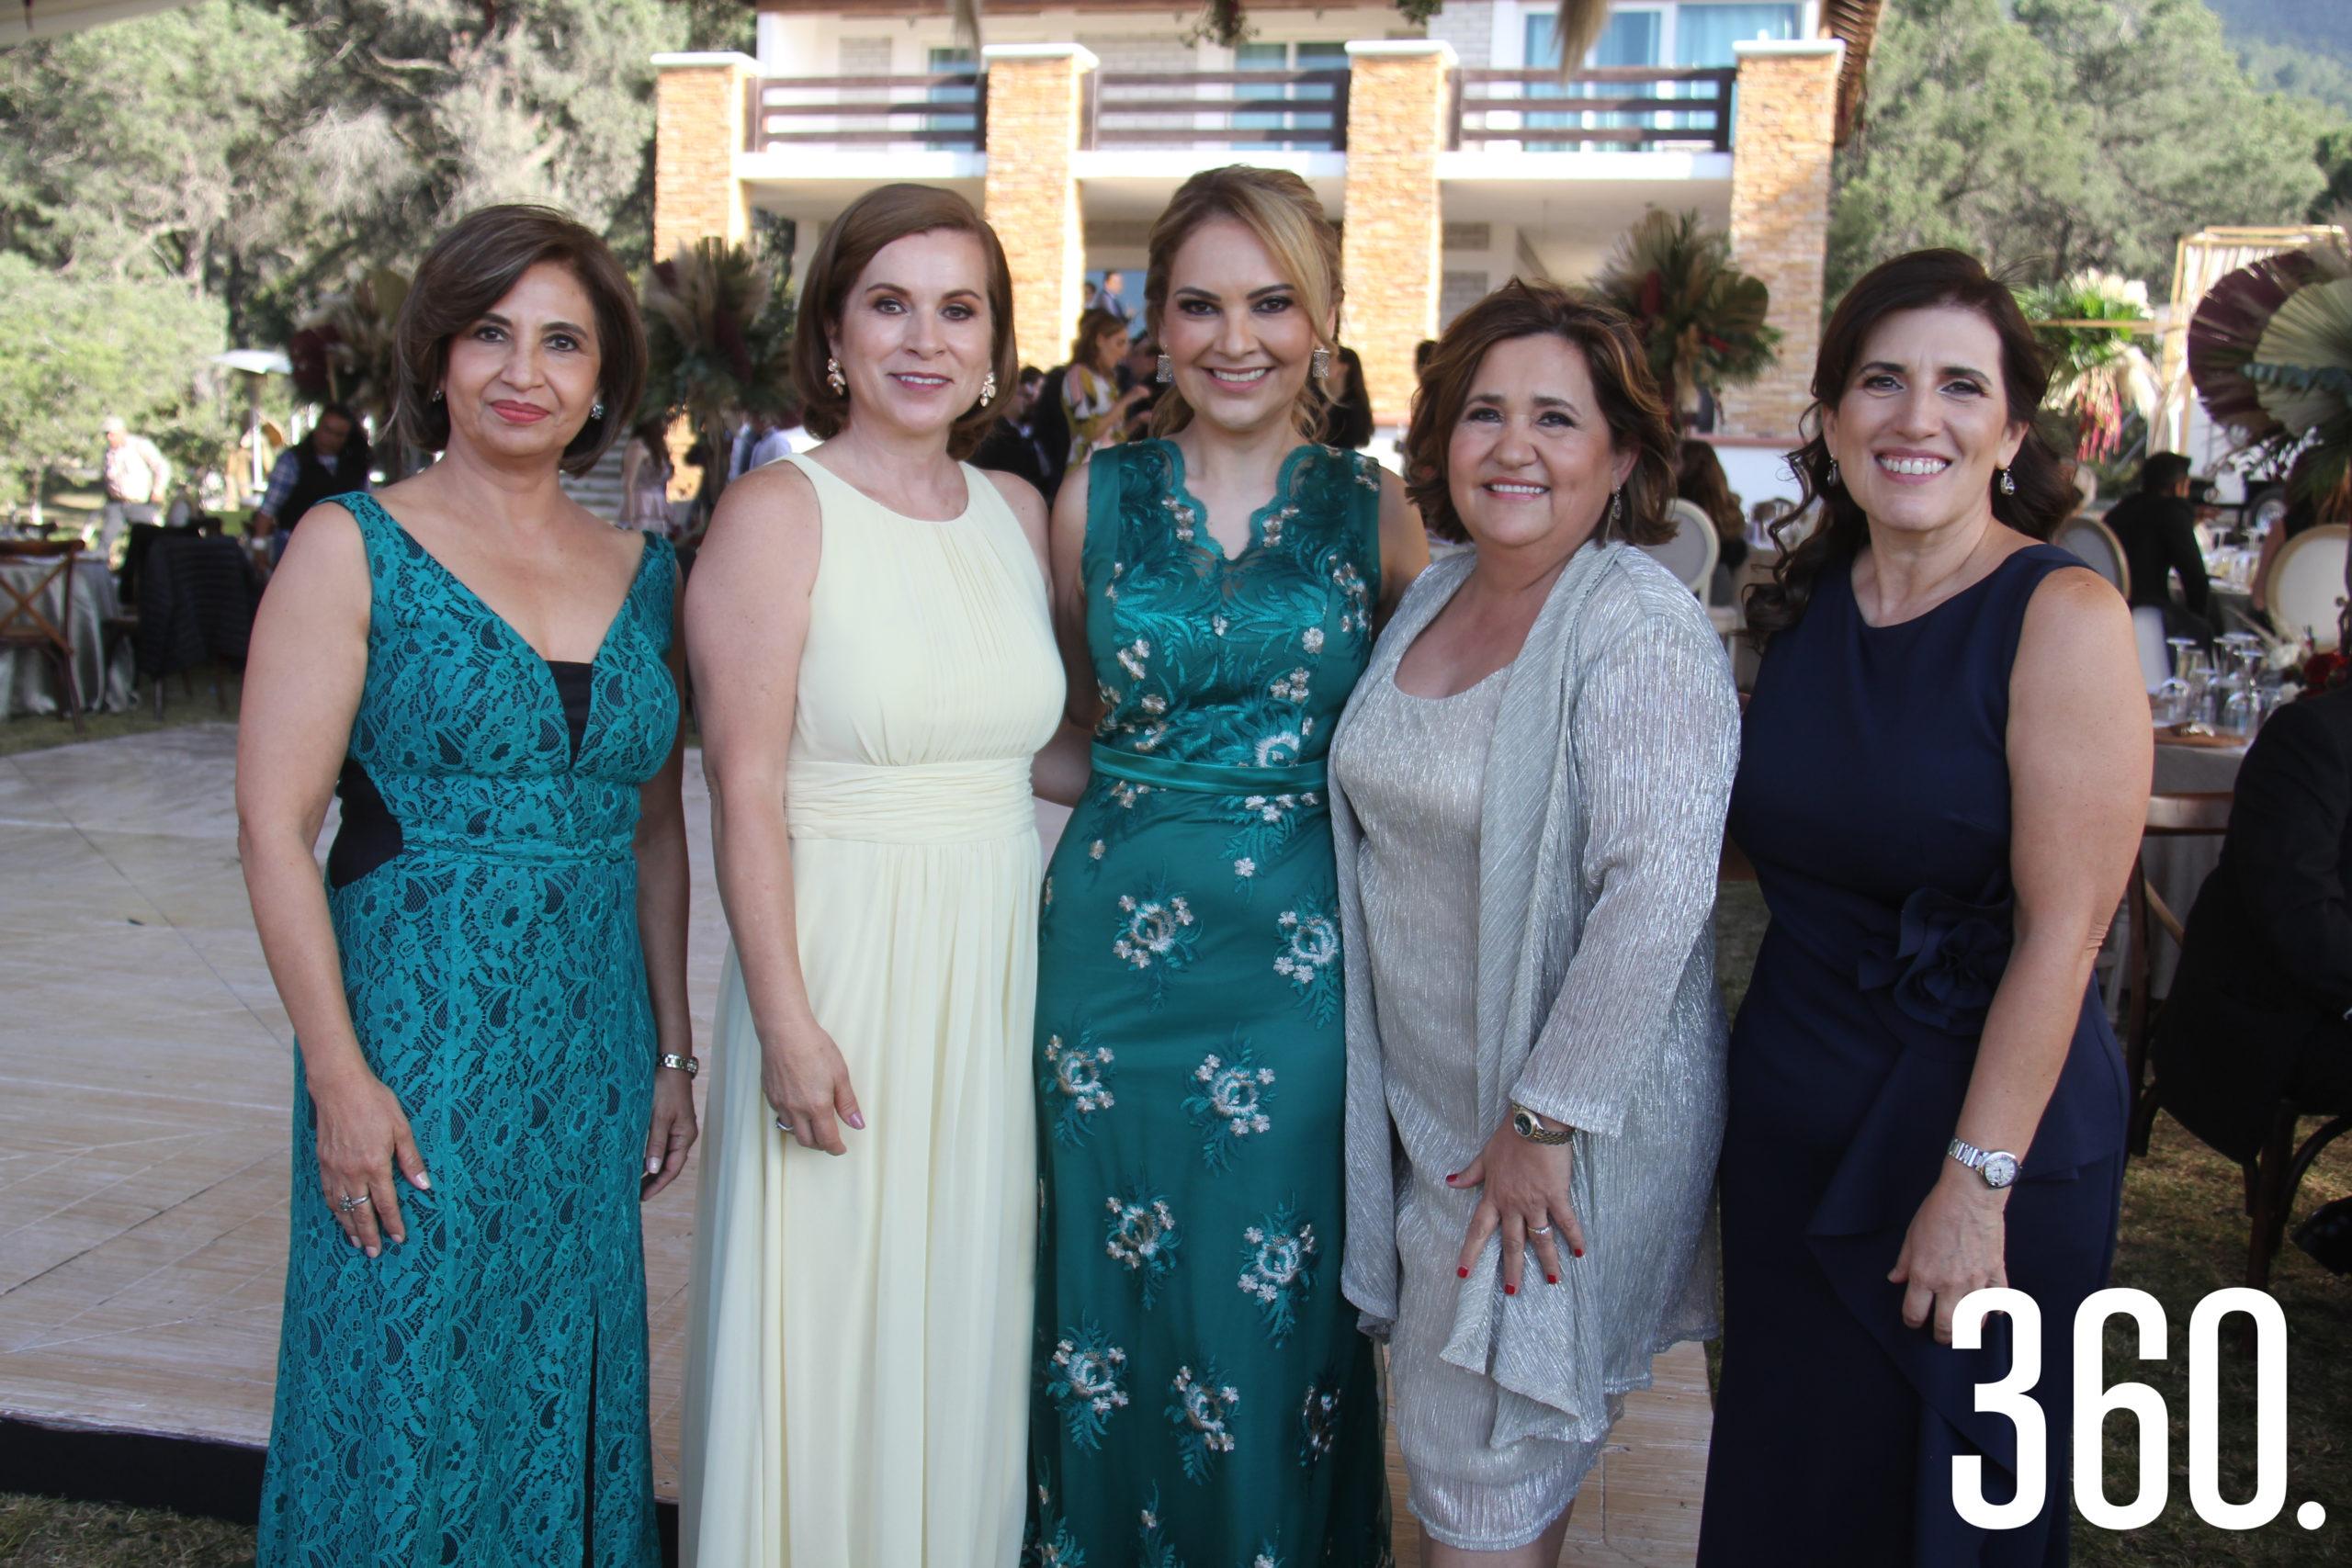 Martha Mireya de Treviño, Gabriela de Morales, Cristina Meraz, Alejandra Arredondo y Martha César.